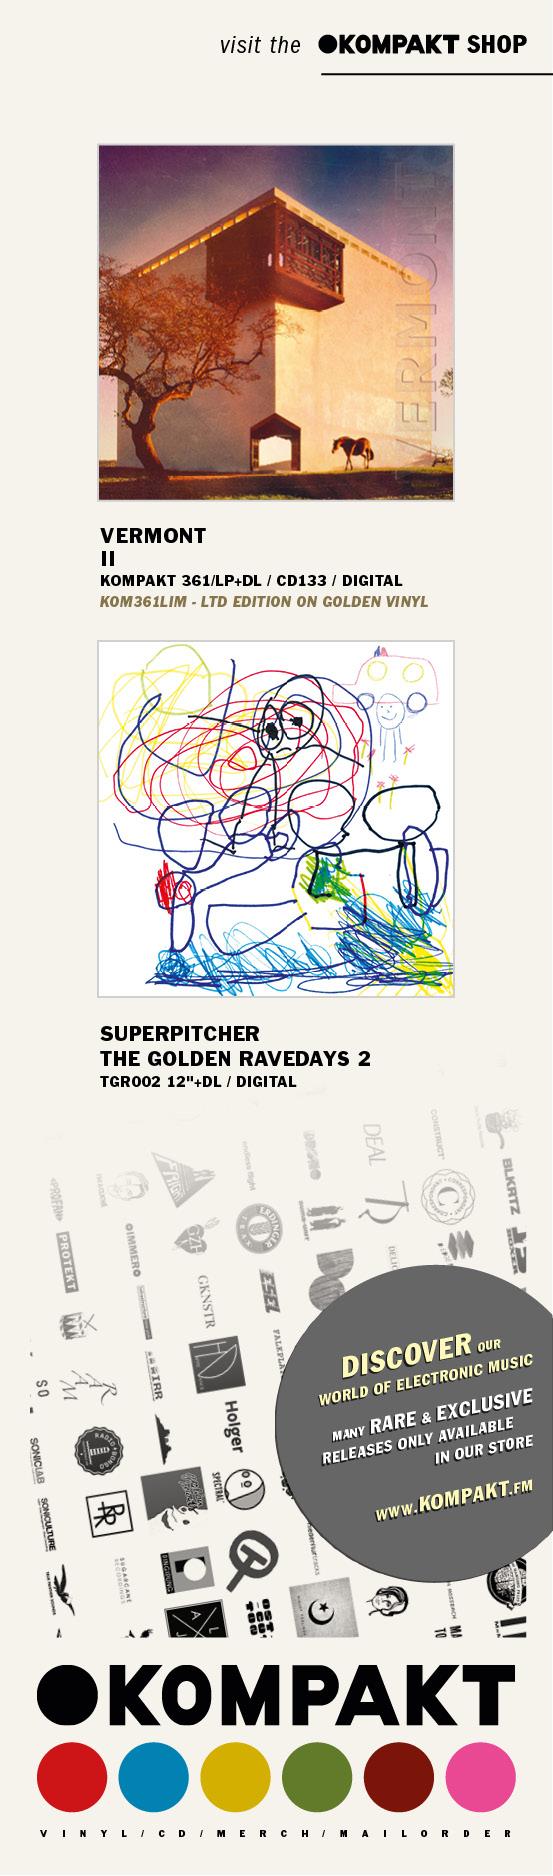 kompakt_kaput_web-ad_nov_150ppi_2